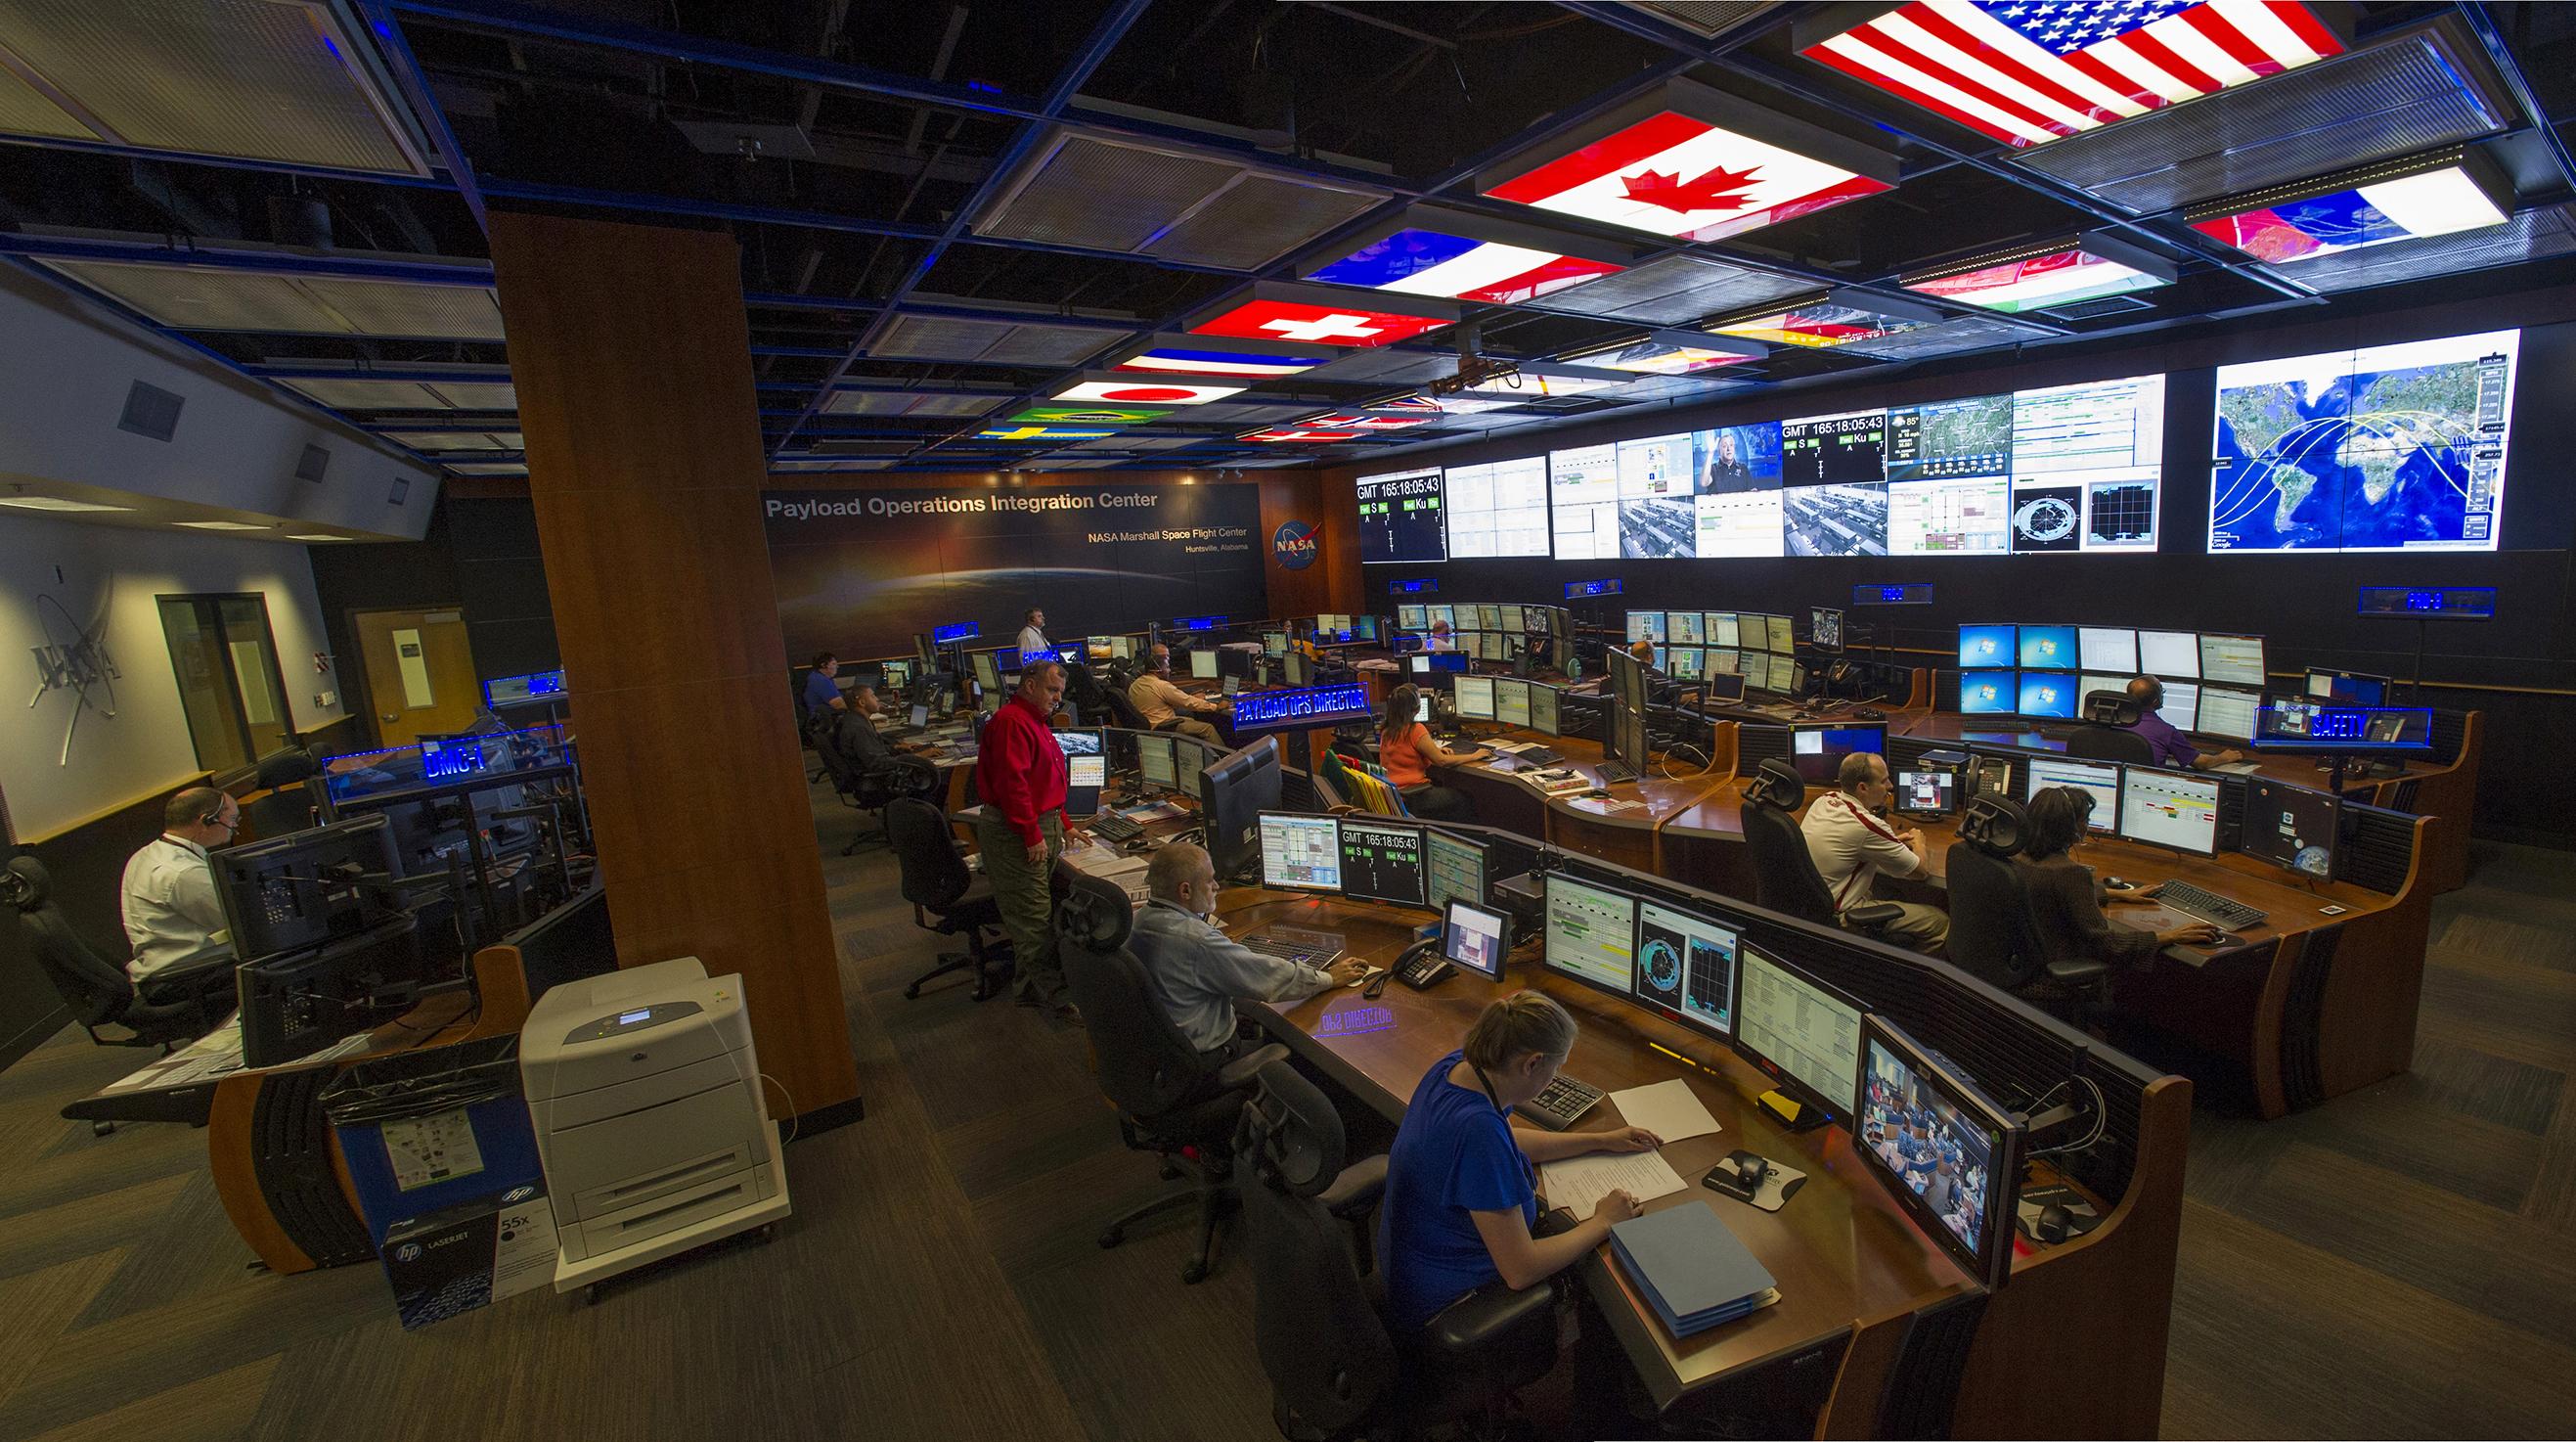 marshall space flight center huntsville - photo #43